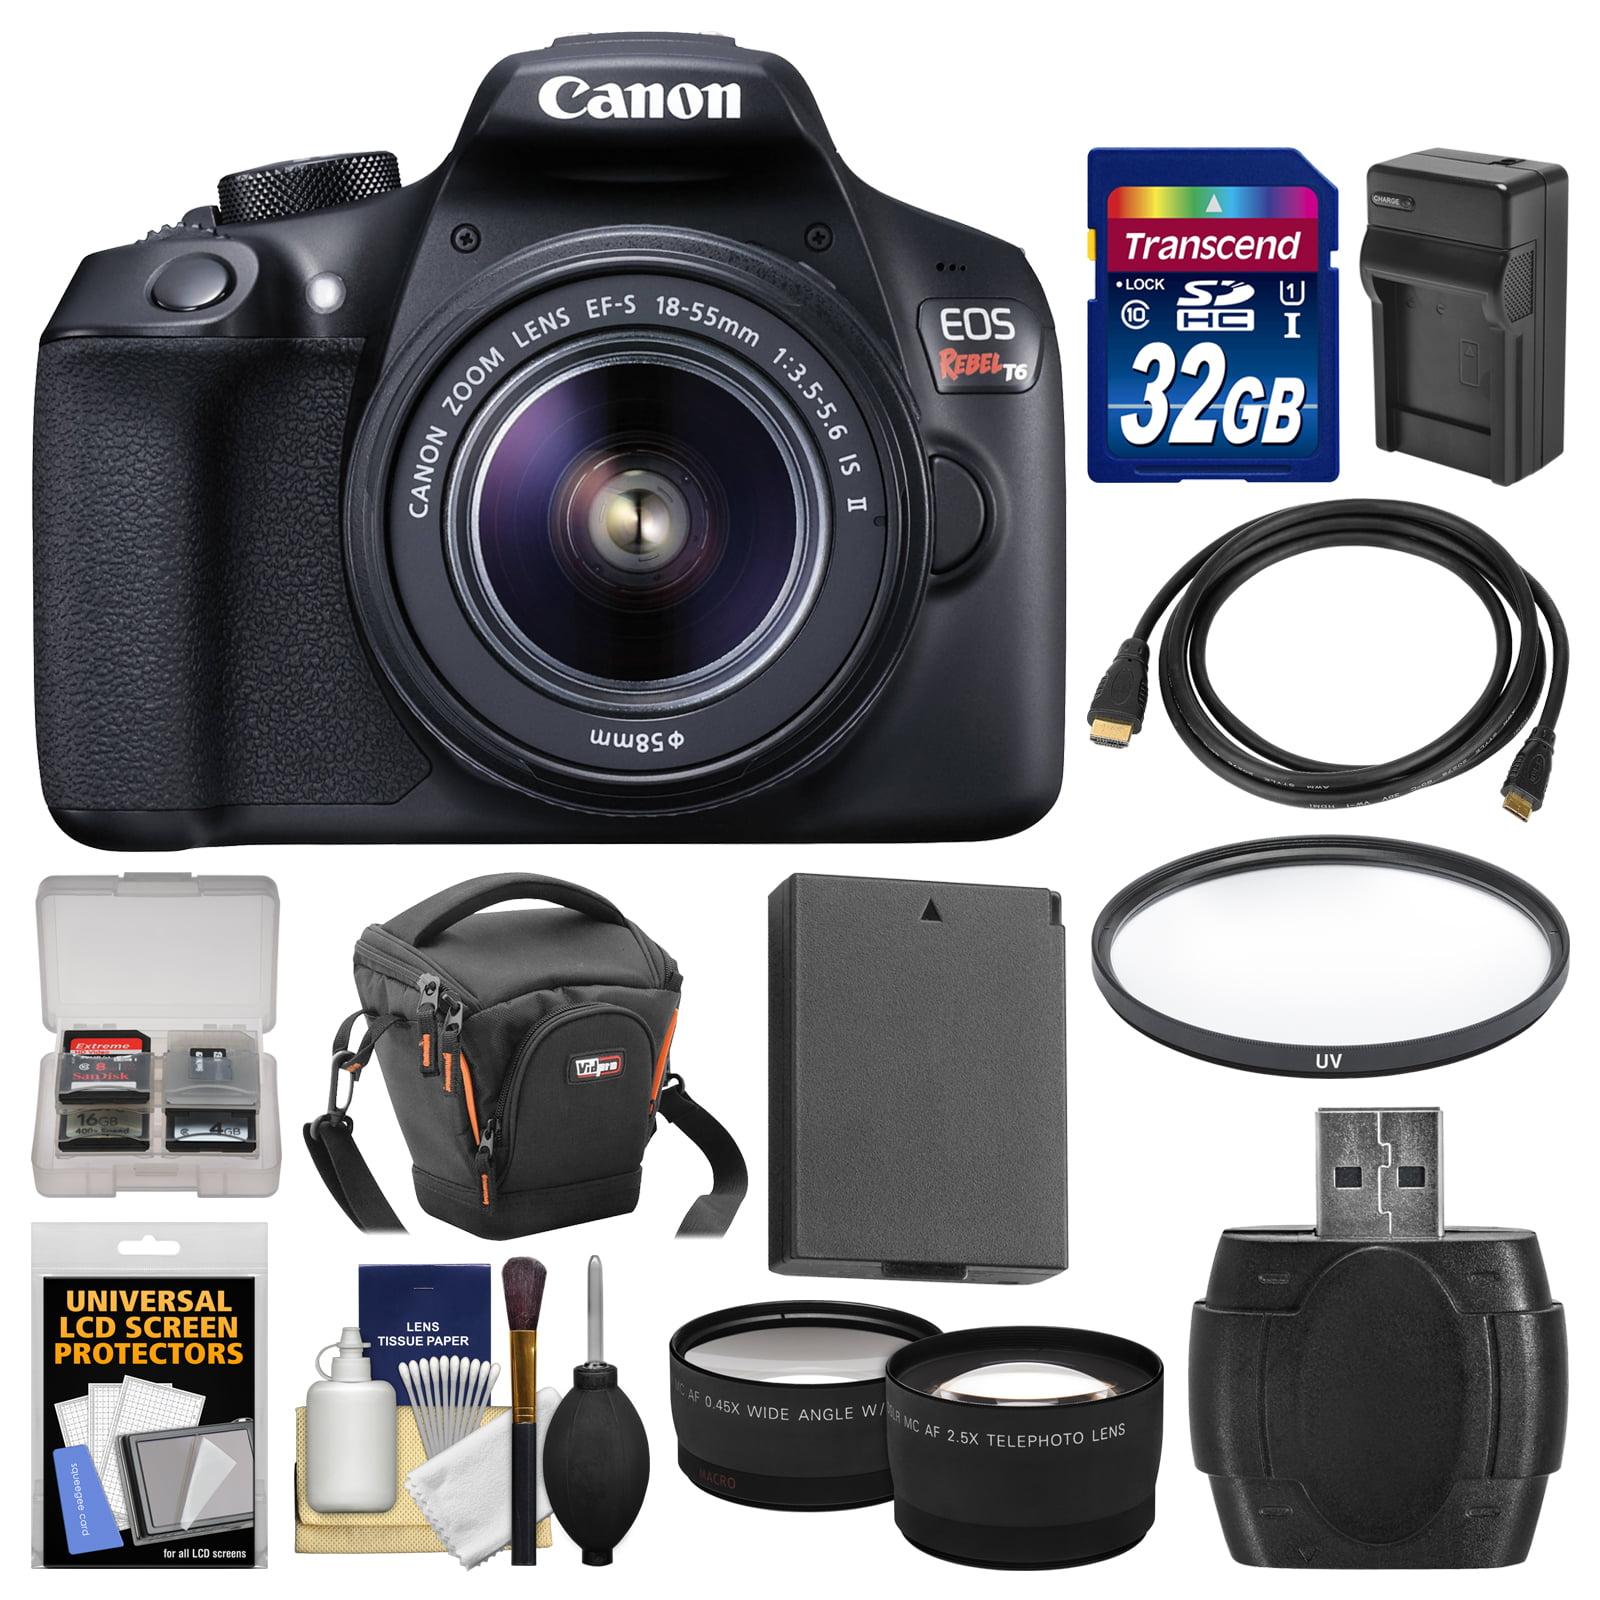 Canon Eos Rebel T6 Wi Fi Digital Slr Camera Amp Ef S 18 55mm